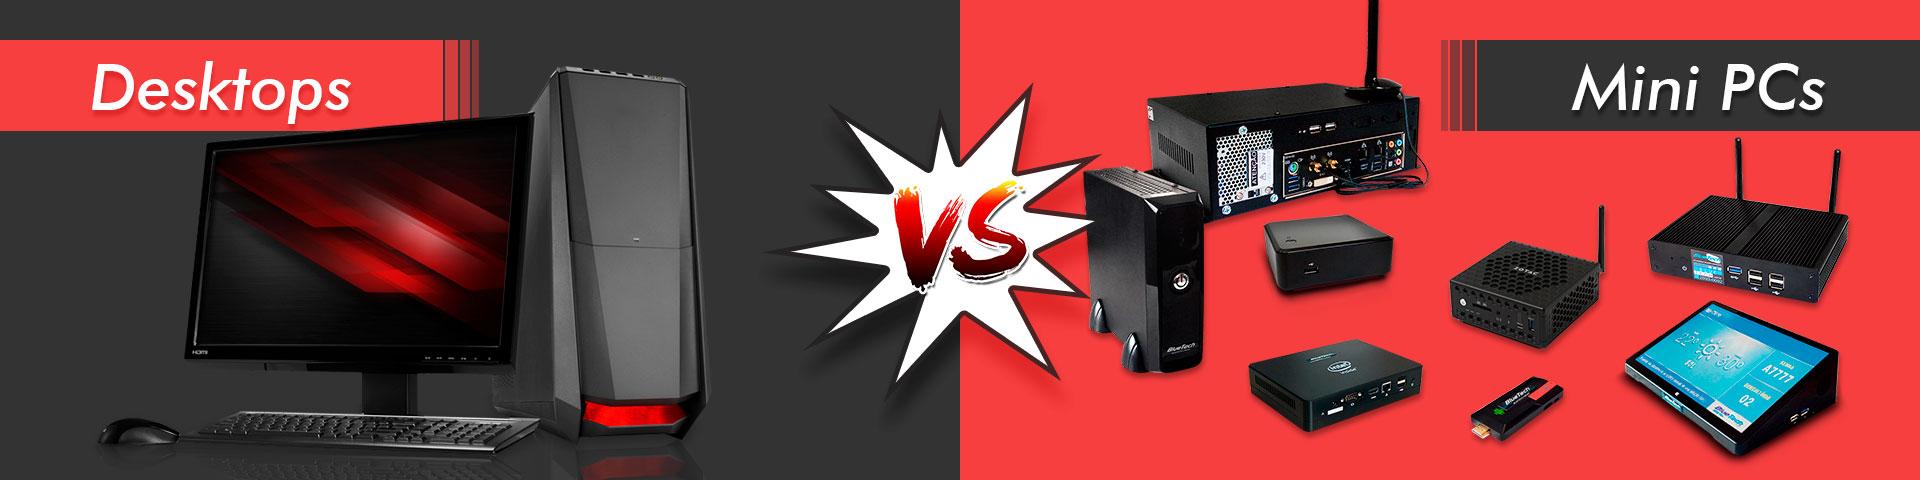 banner-desktop-vs-minipc